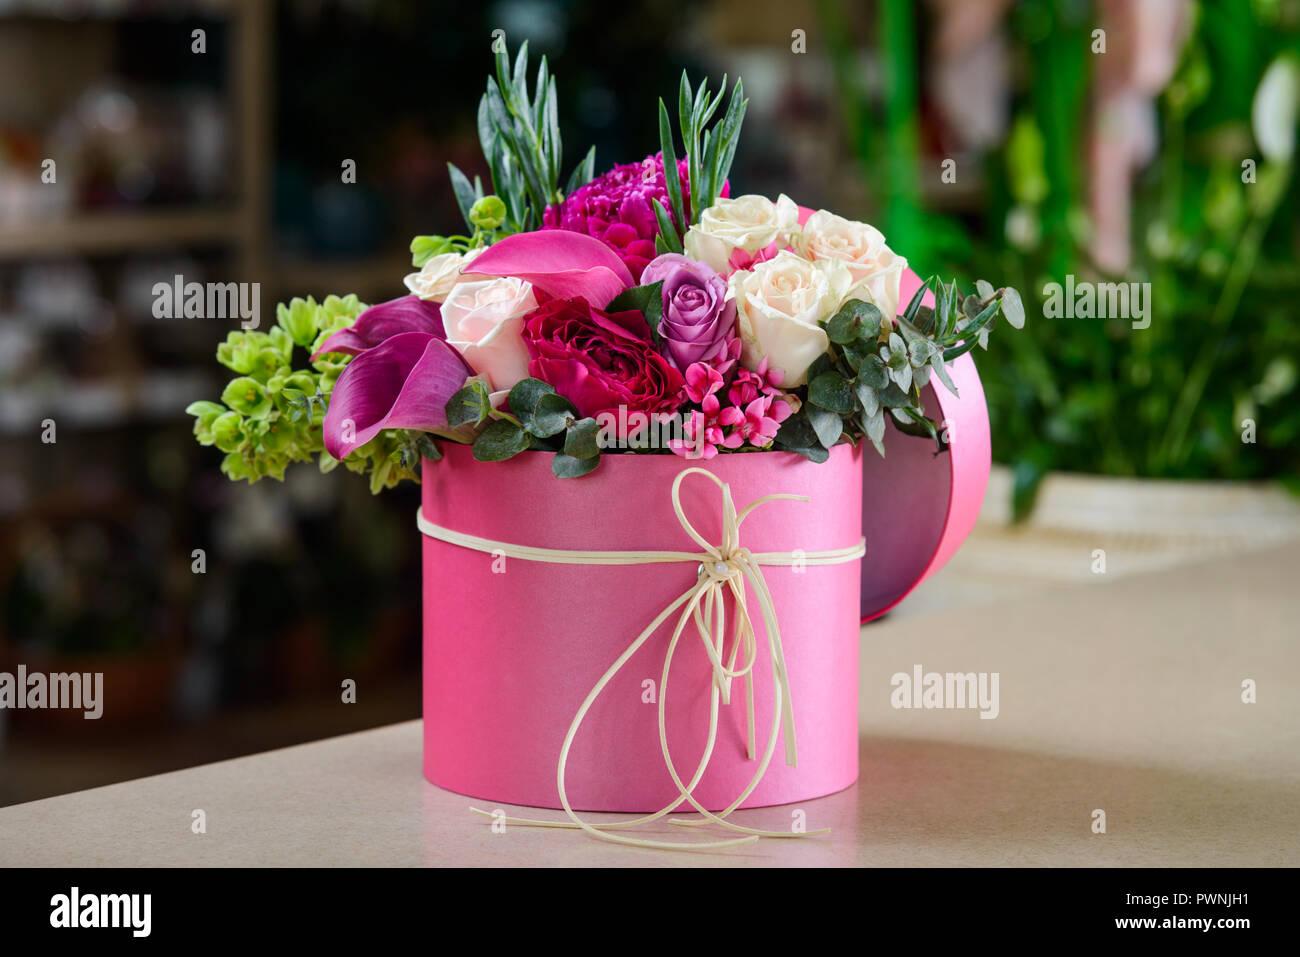 Flower delivery box stock photos flower delivery box stock images pink box with flower bouquet stock image izmirmasajfo